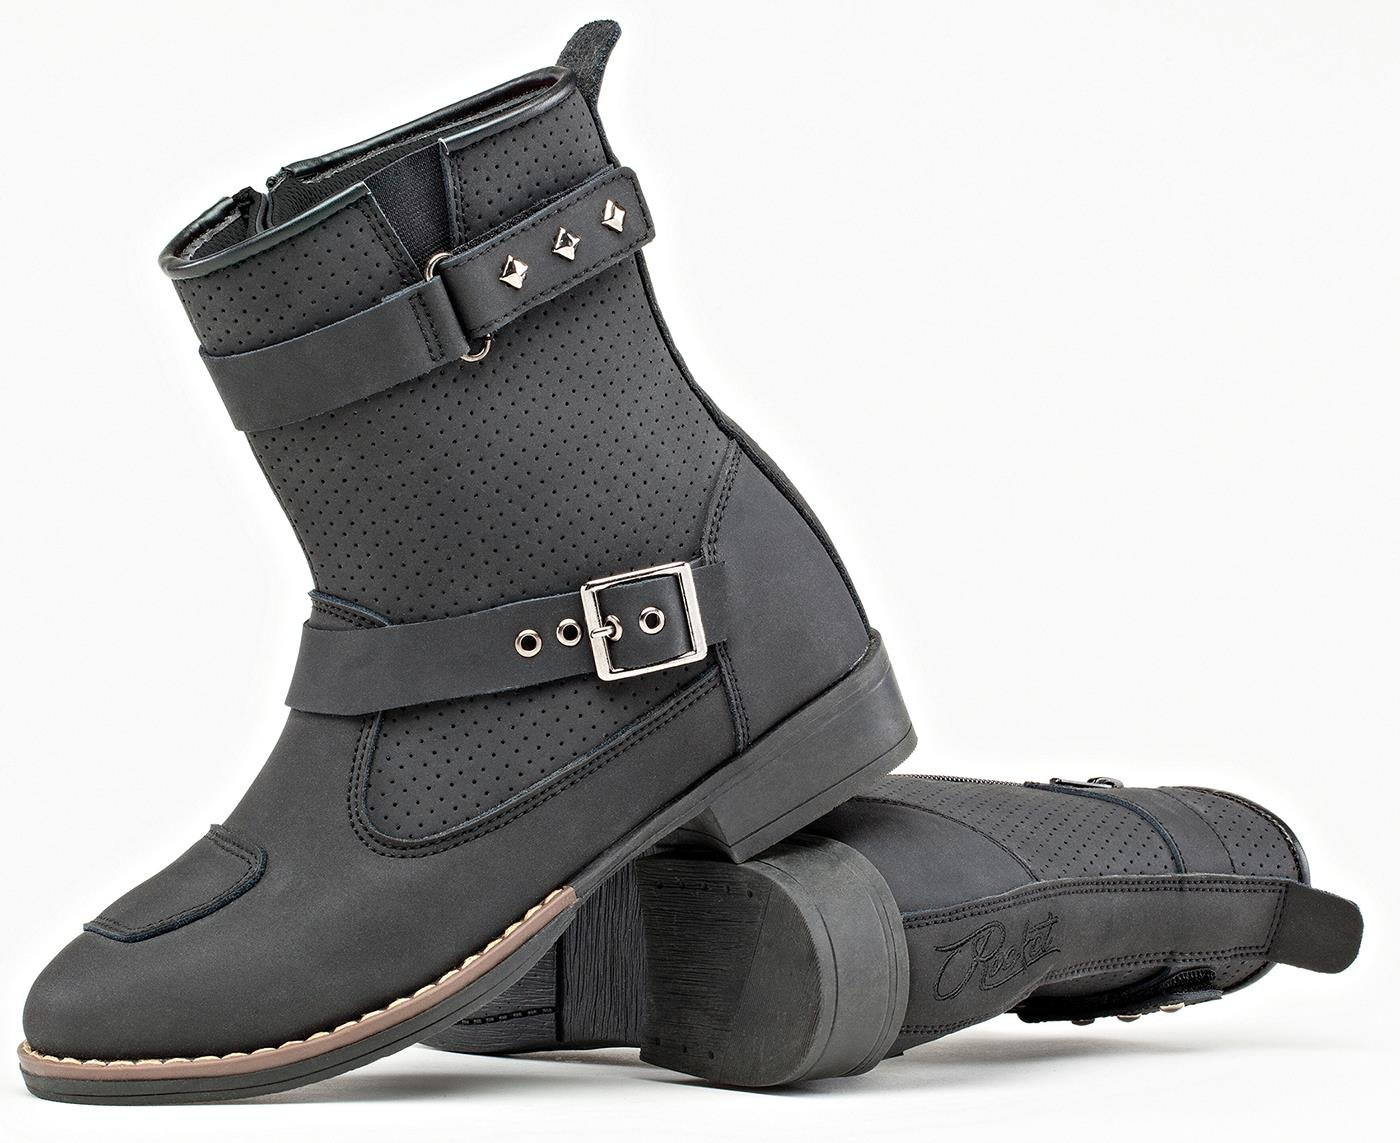 Joe Rocket Moto Adira Ladies Womens Leather Riding Boots Black SZ 12